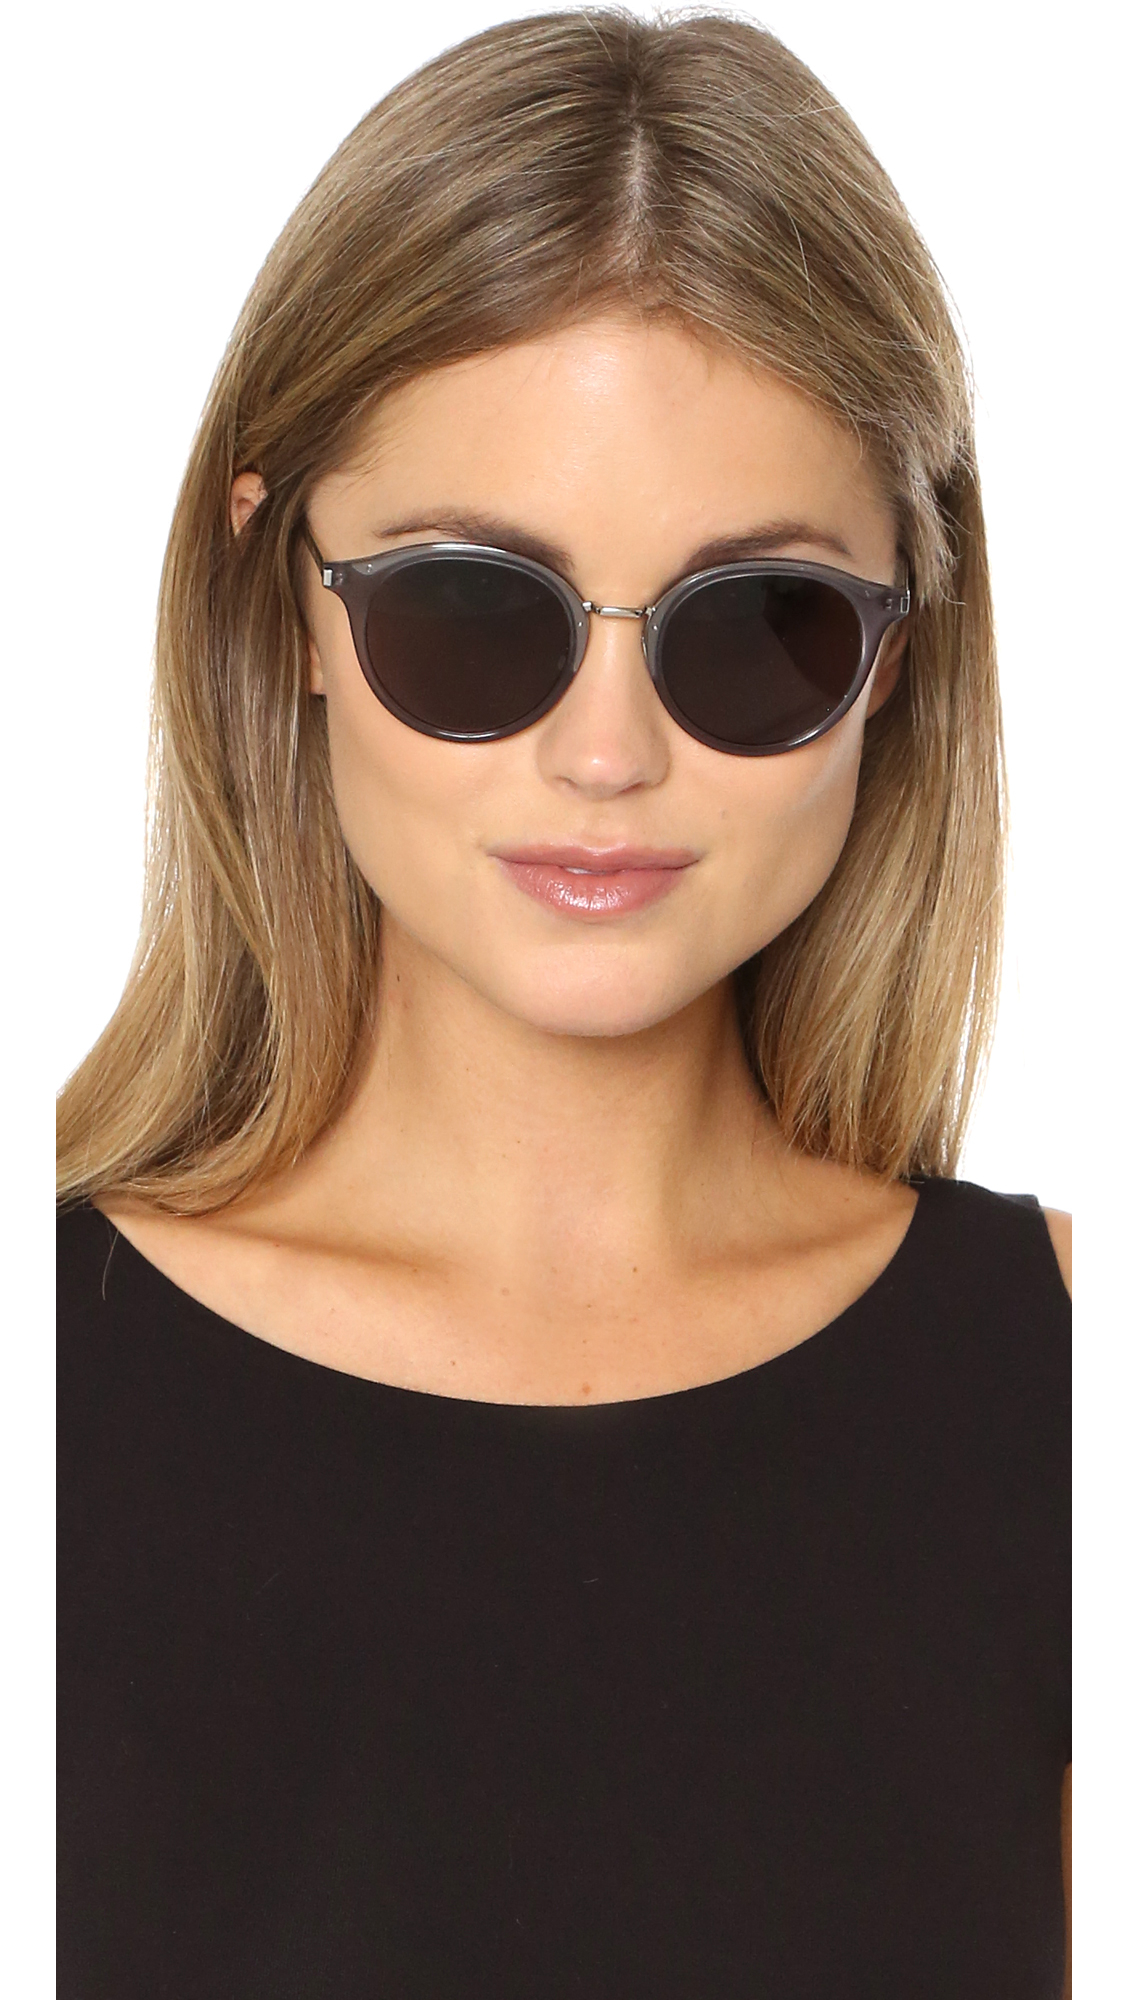 4963d295728 Lyst - Saint Laurent Sl 57 Sunglasses in Gray